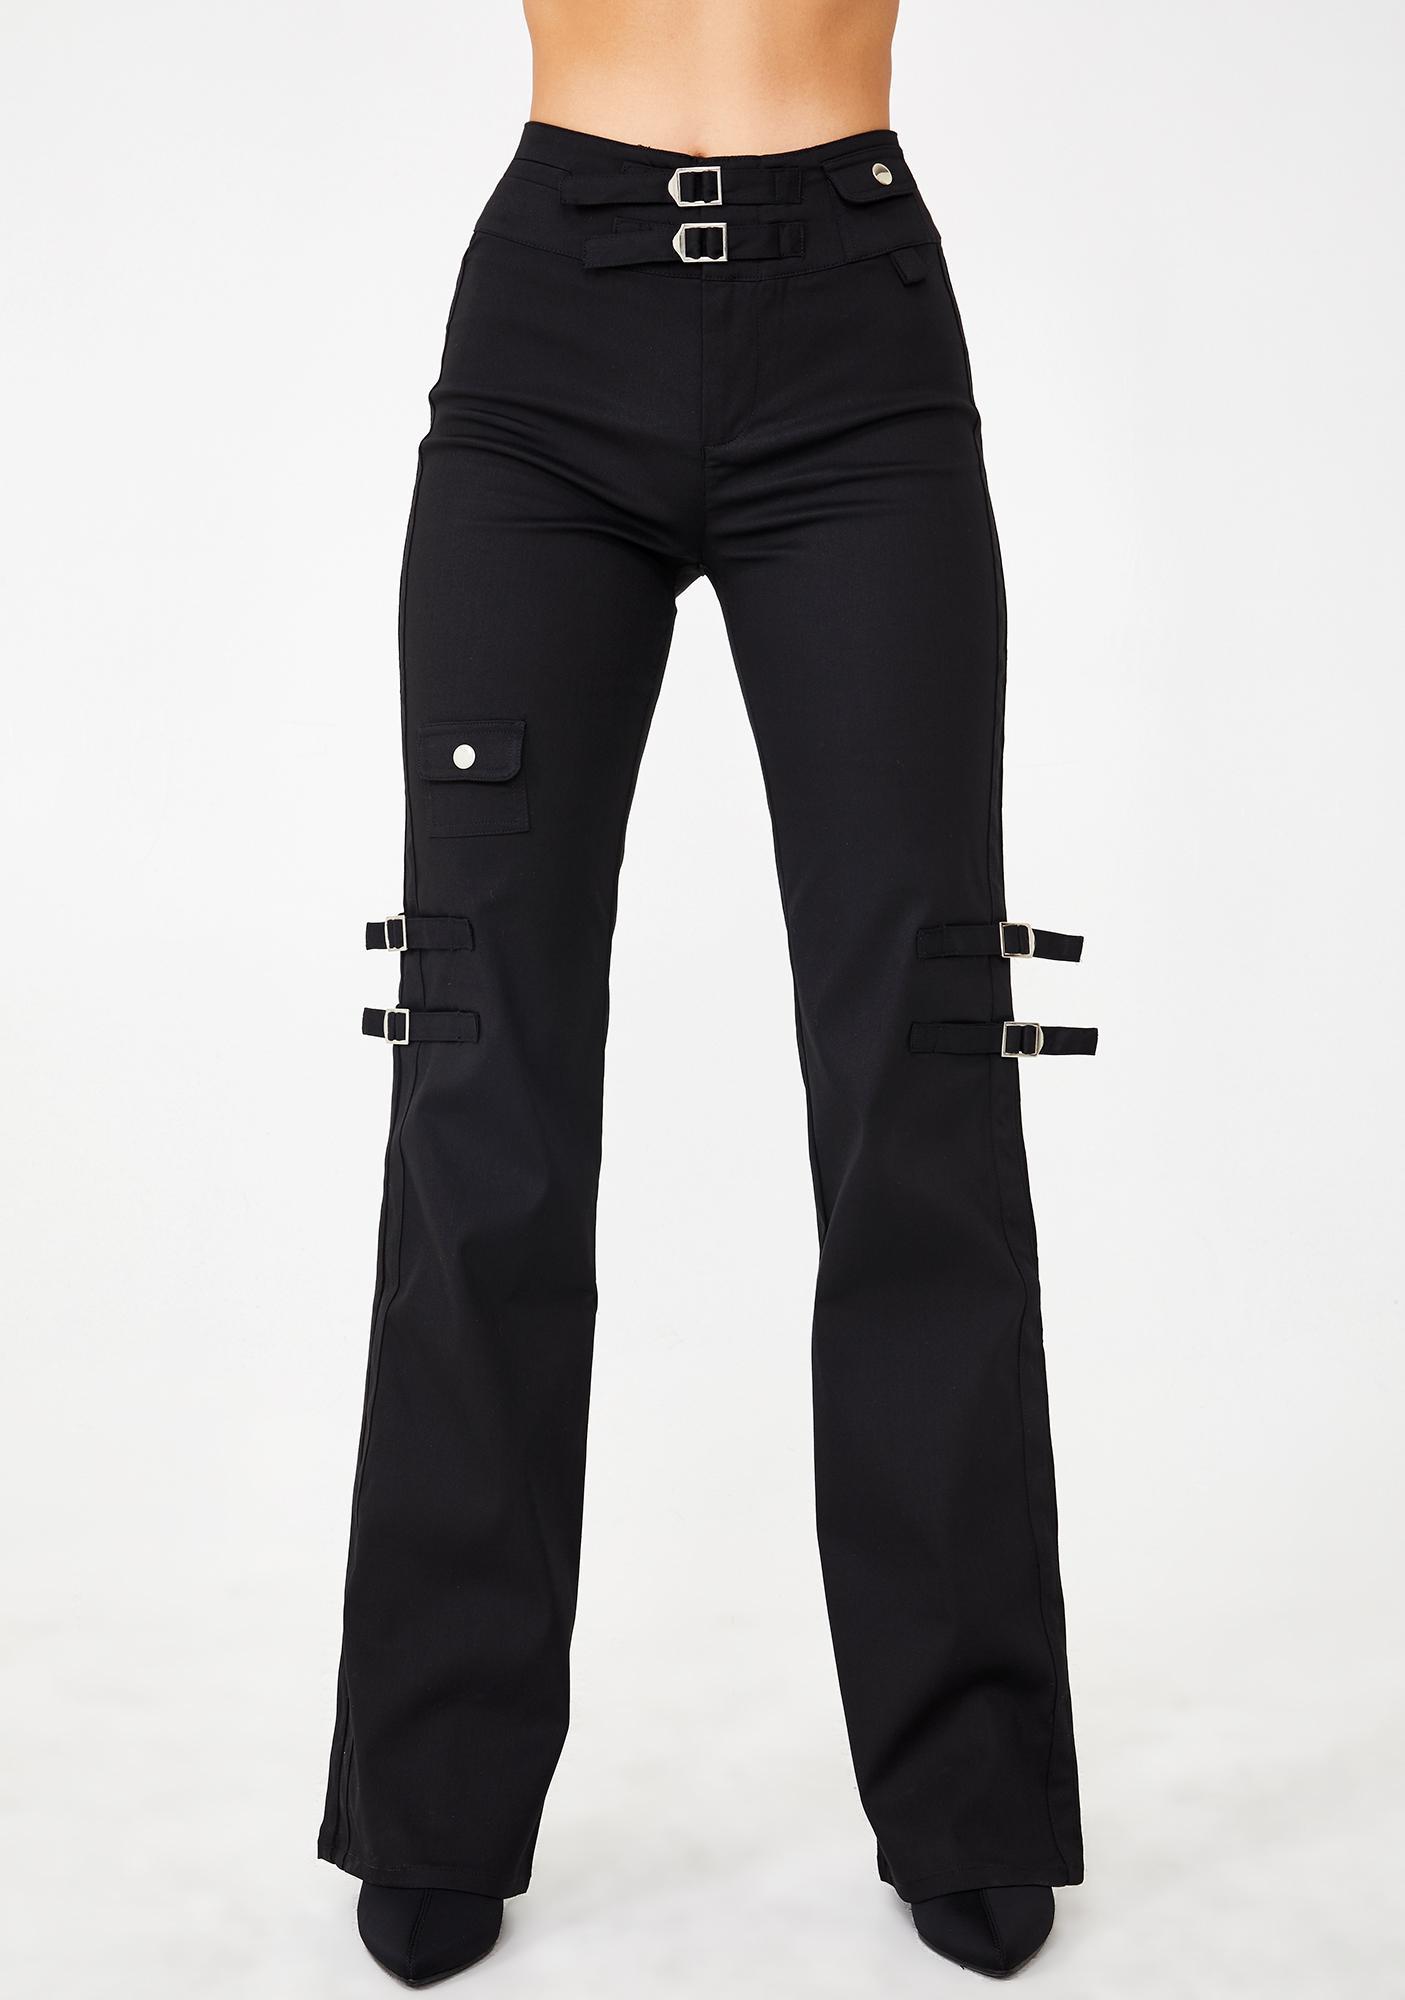 Adrienne Cargo Pants by I Am Gia